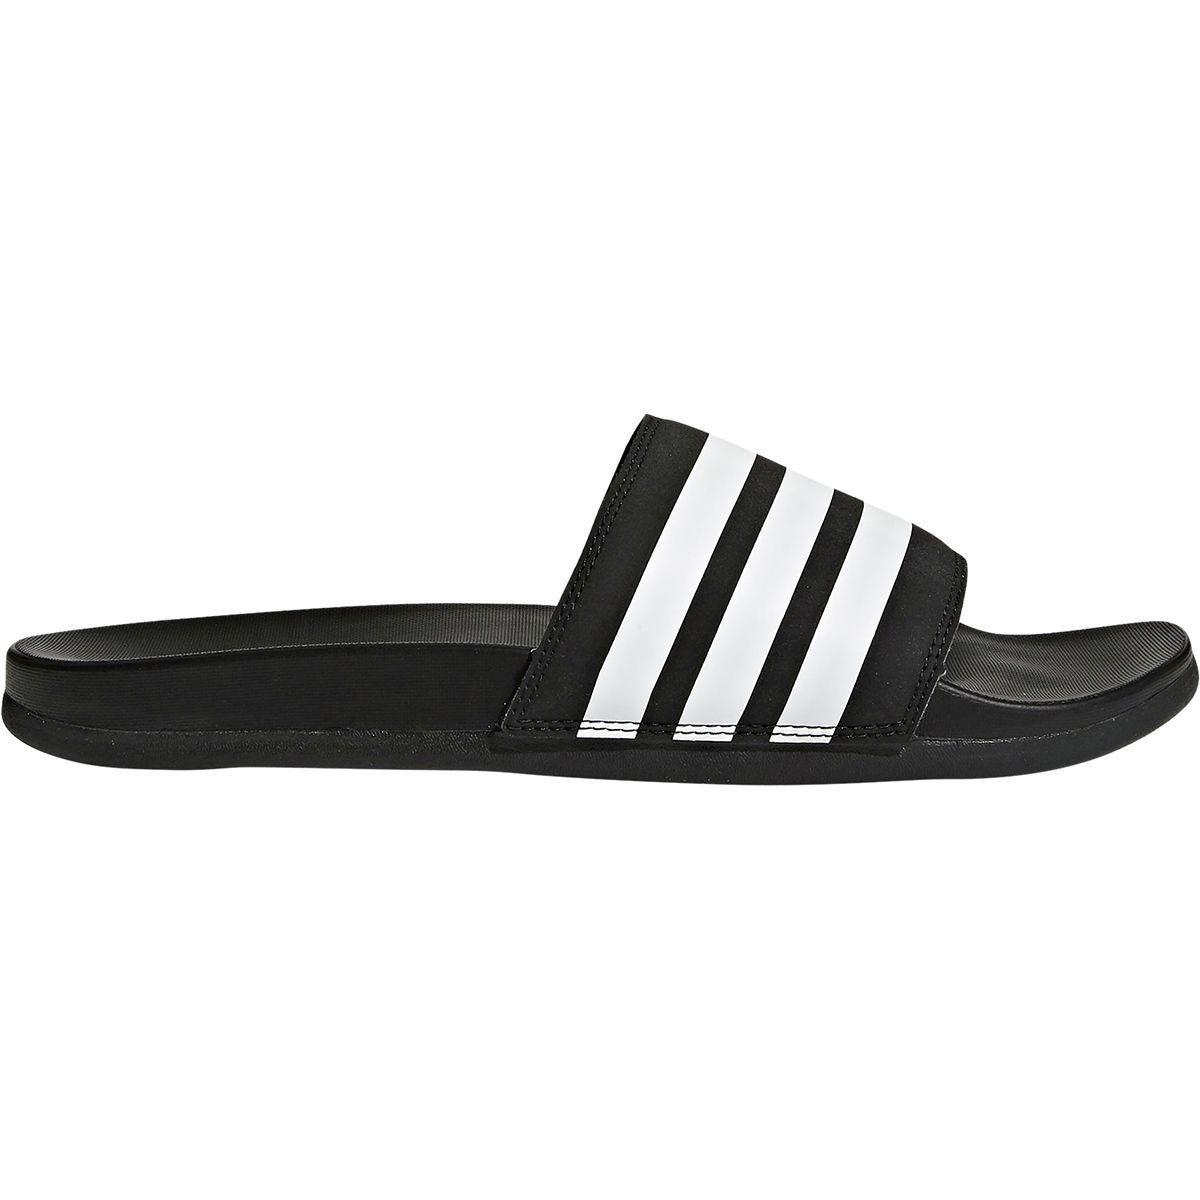 gato vendedor Edad adulta  Adilette Comfort Sandal - Men's #manoutfit You'd swear you've the Adidas  Men's Adilette Comfort Sandal at literally every hot… | Adidas, Adidas  adilette, Adidas men